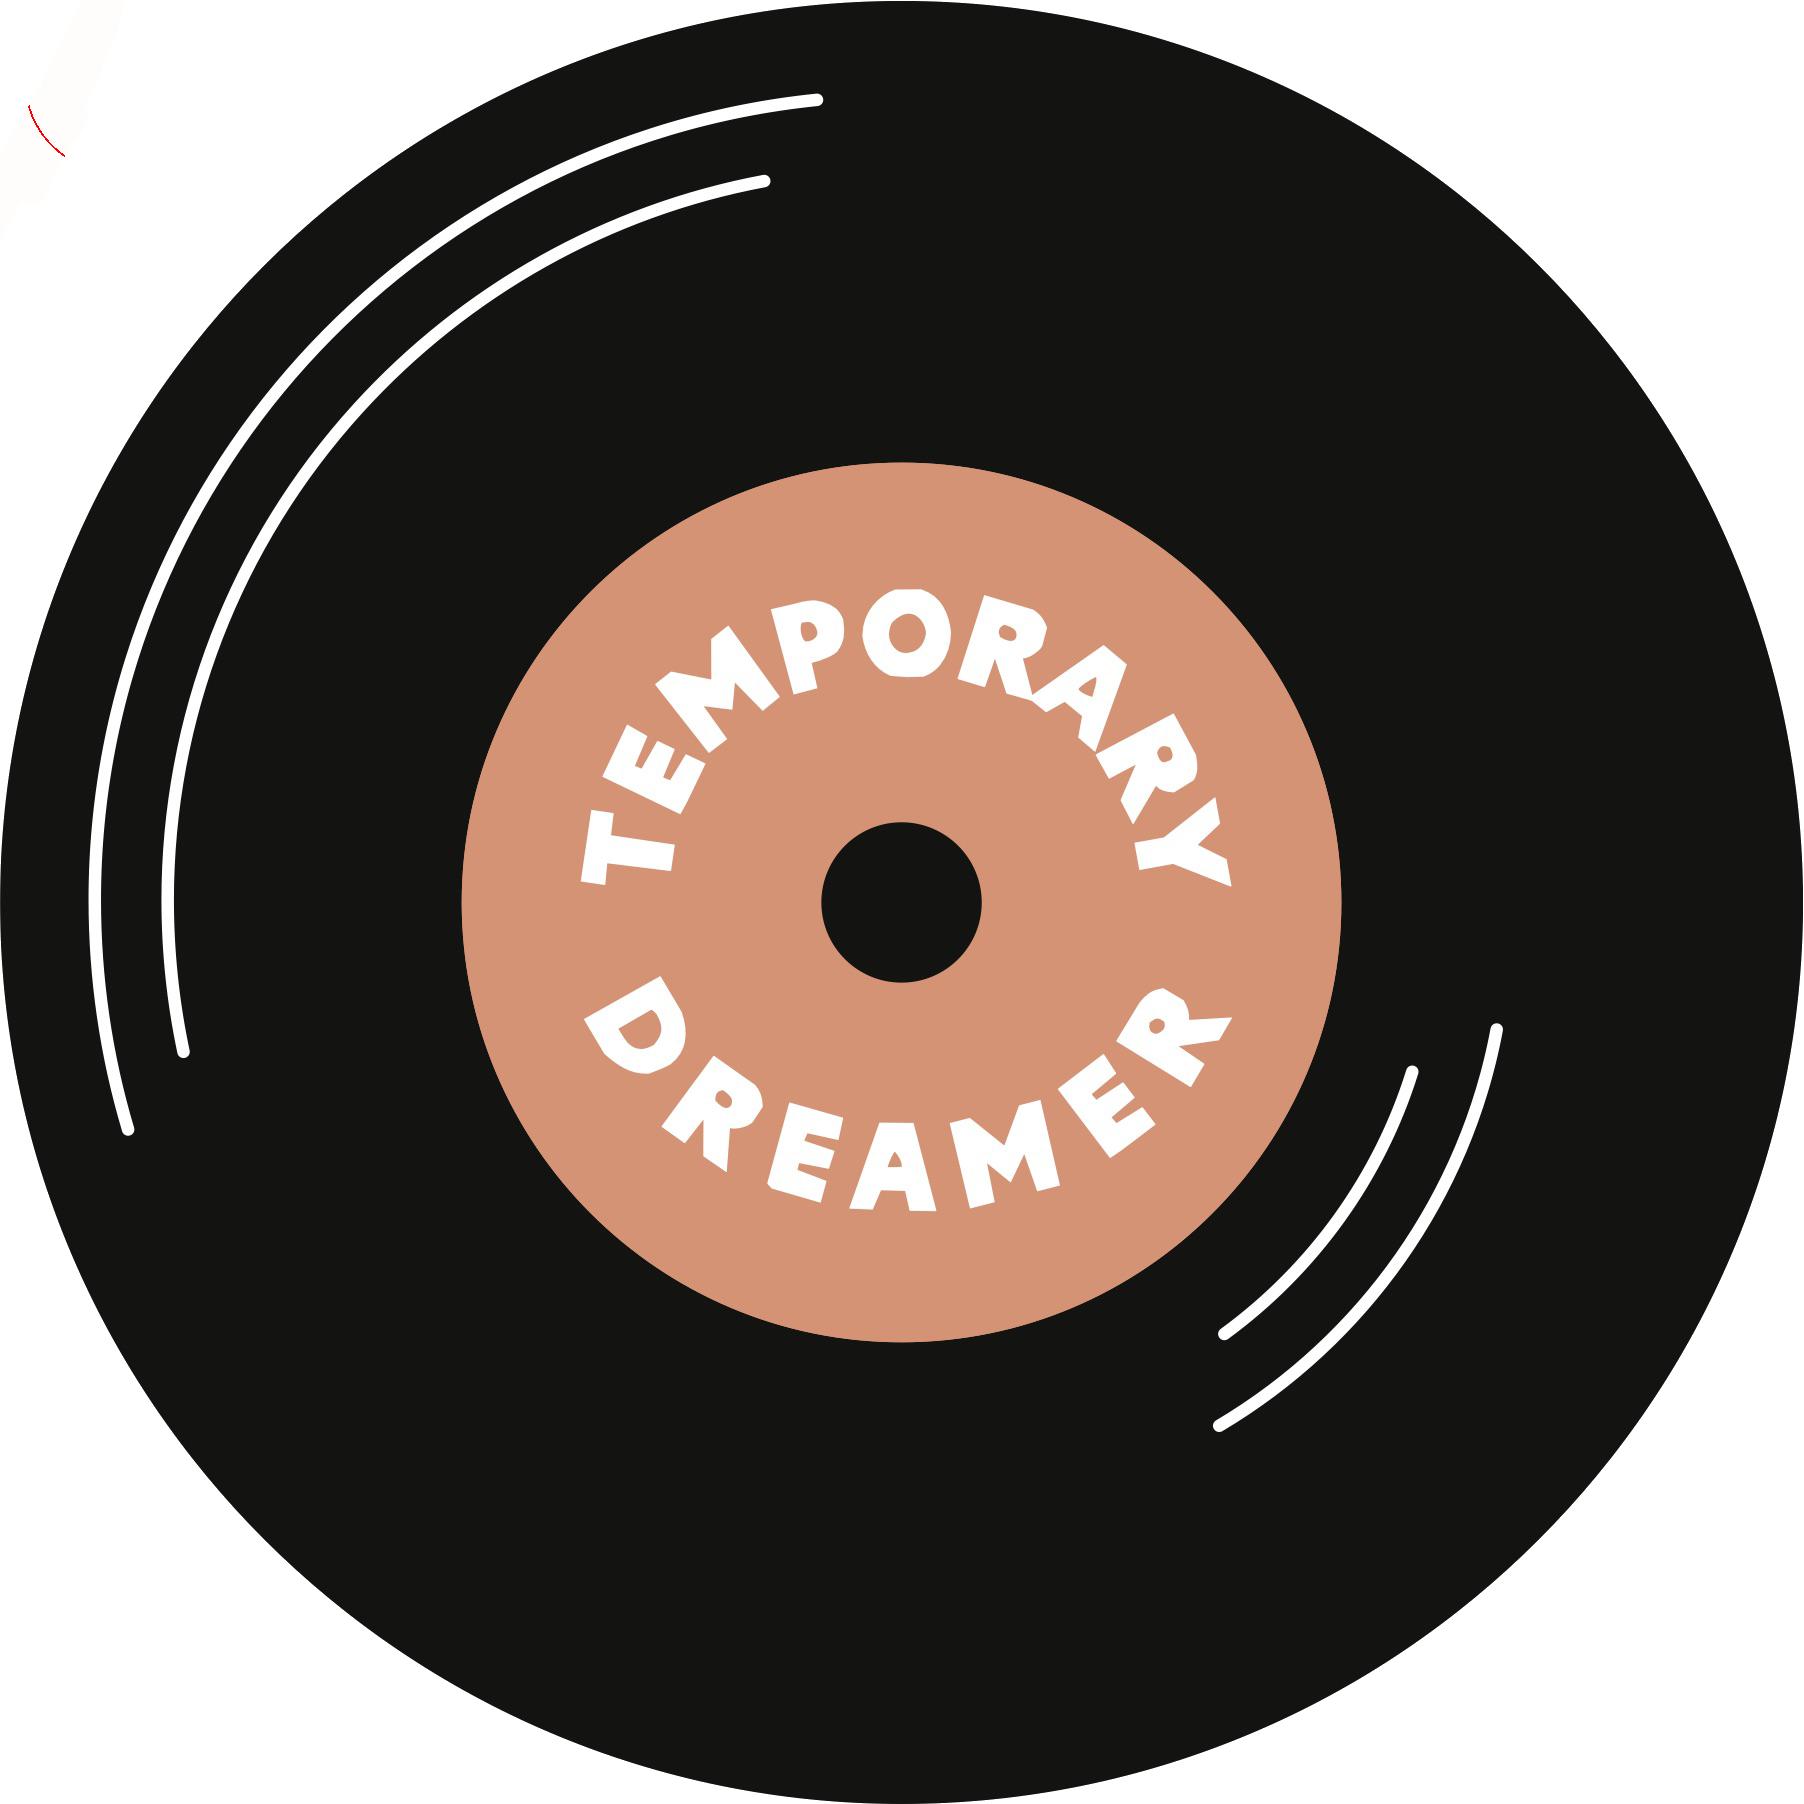 Temporary Dreamer